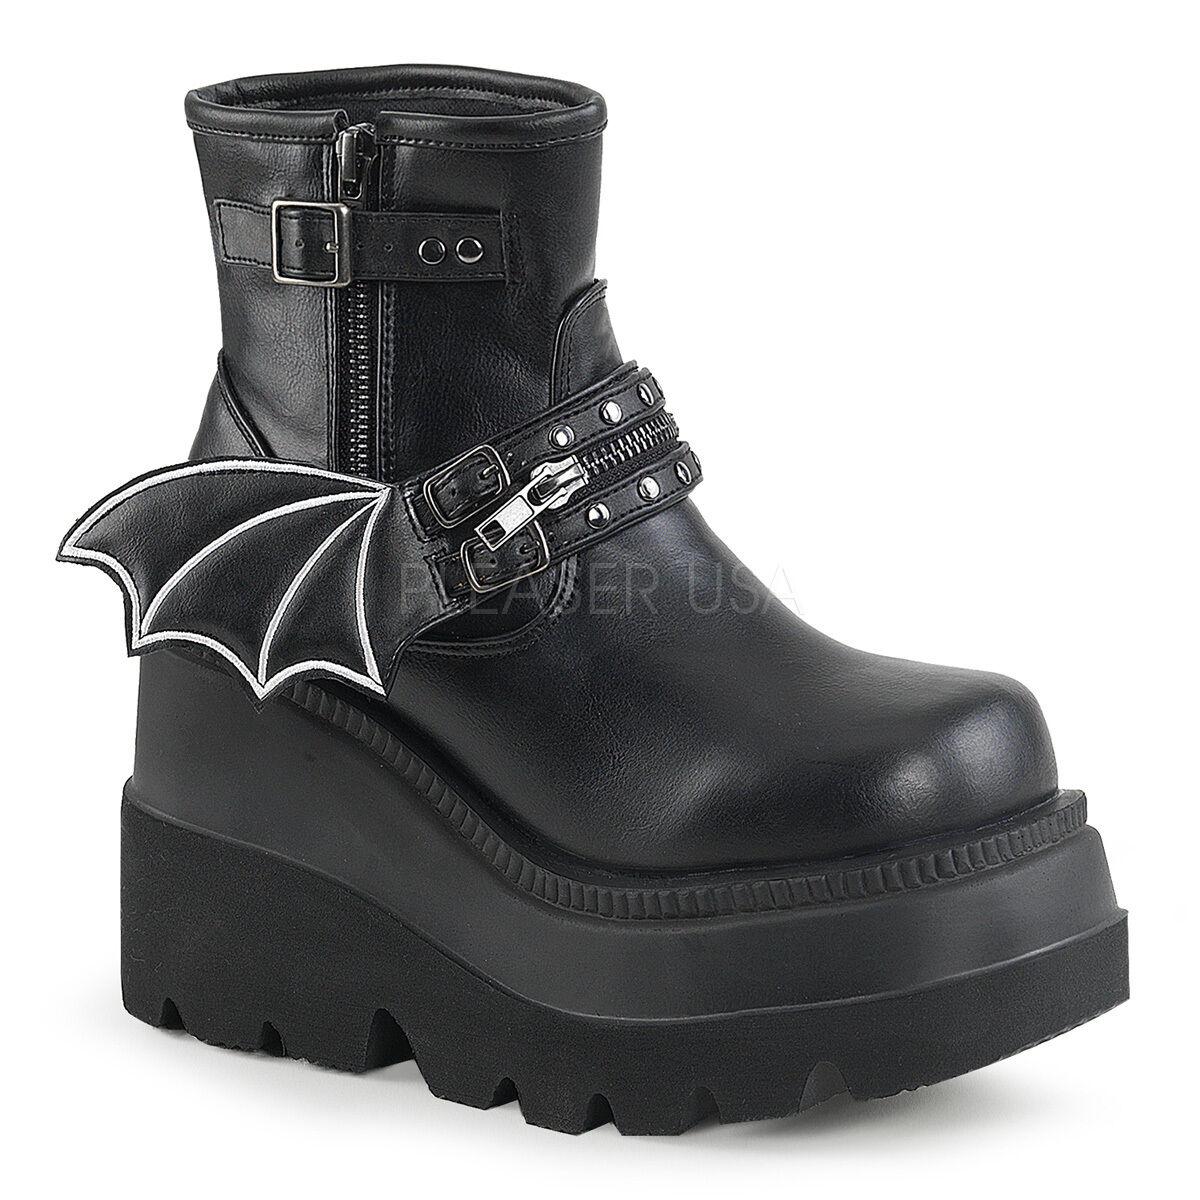 Punk Goth Gothic Gothic Gothic 4  Heel Platform Ankle High Stiefel w  Batwing Zipperot Strap f26e3a